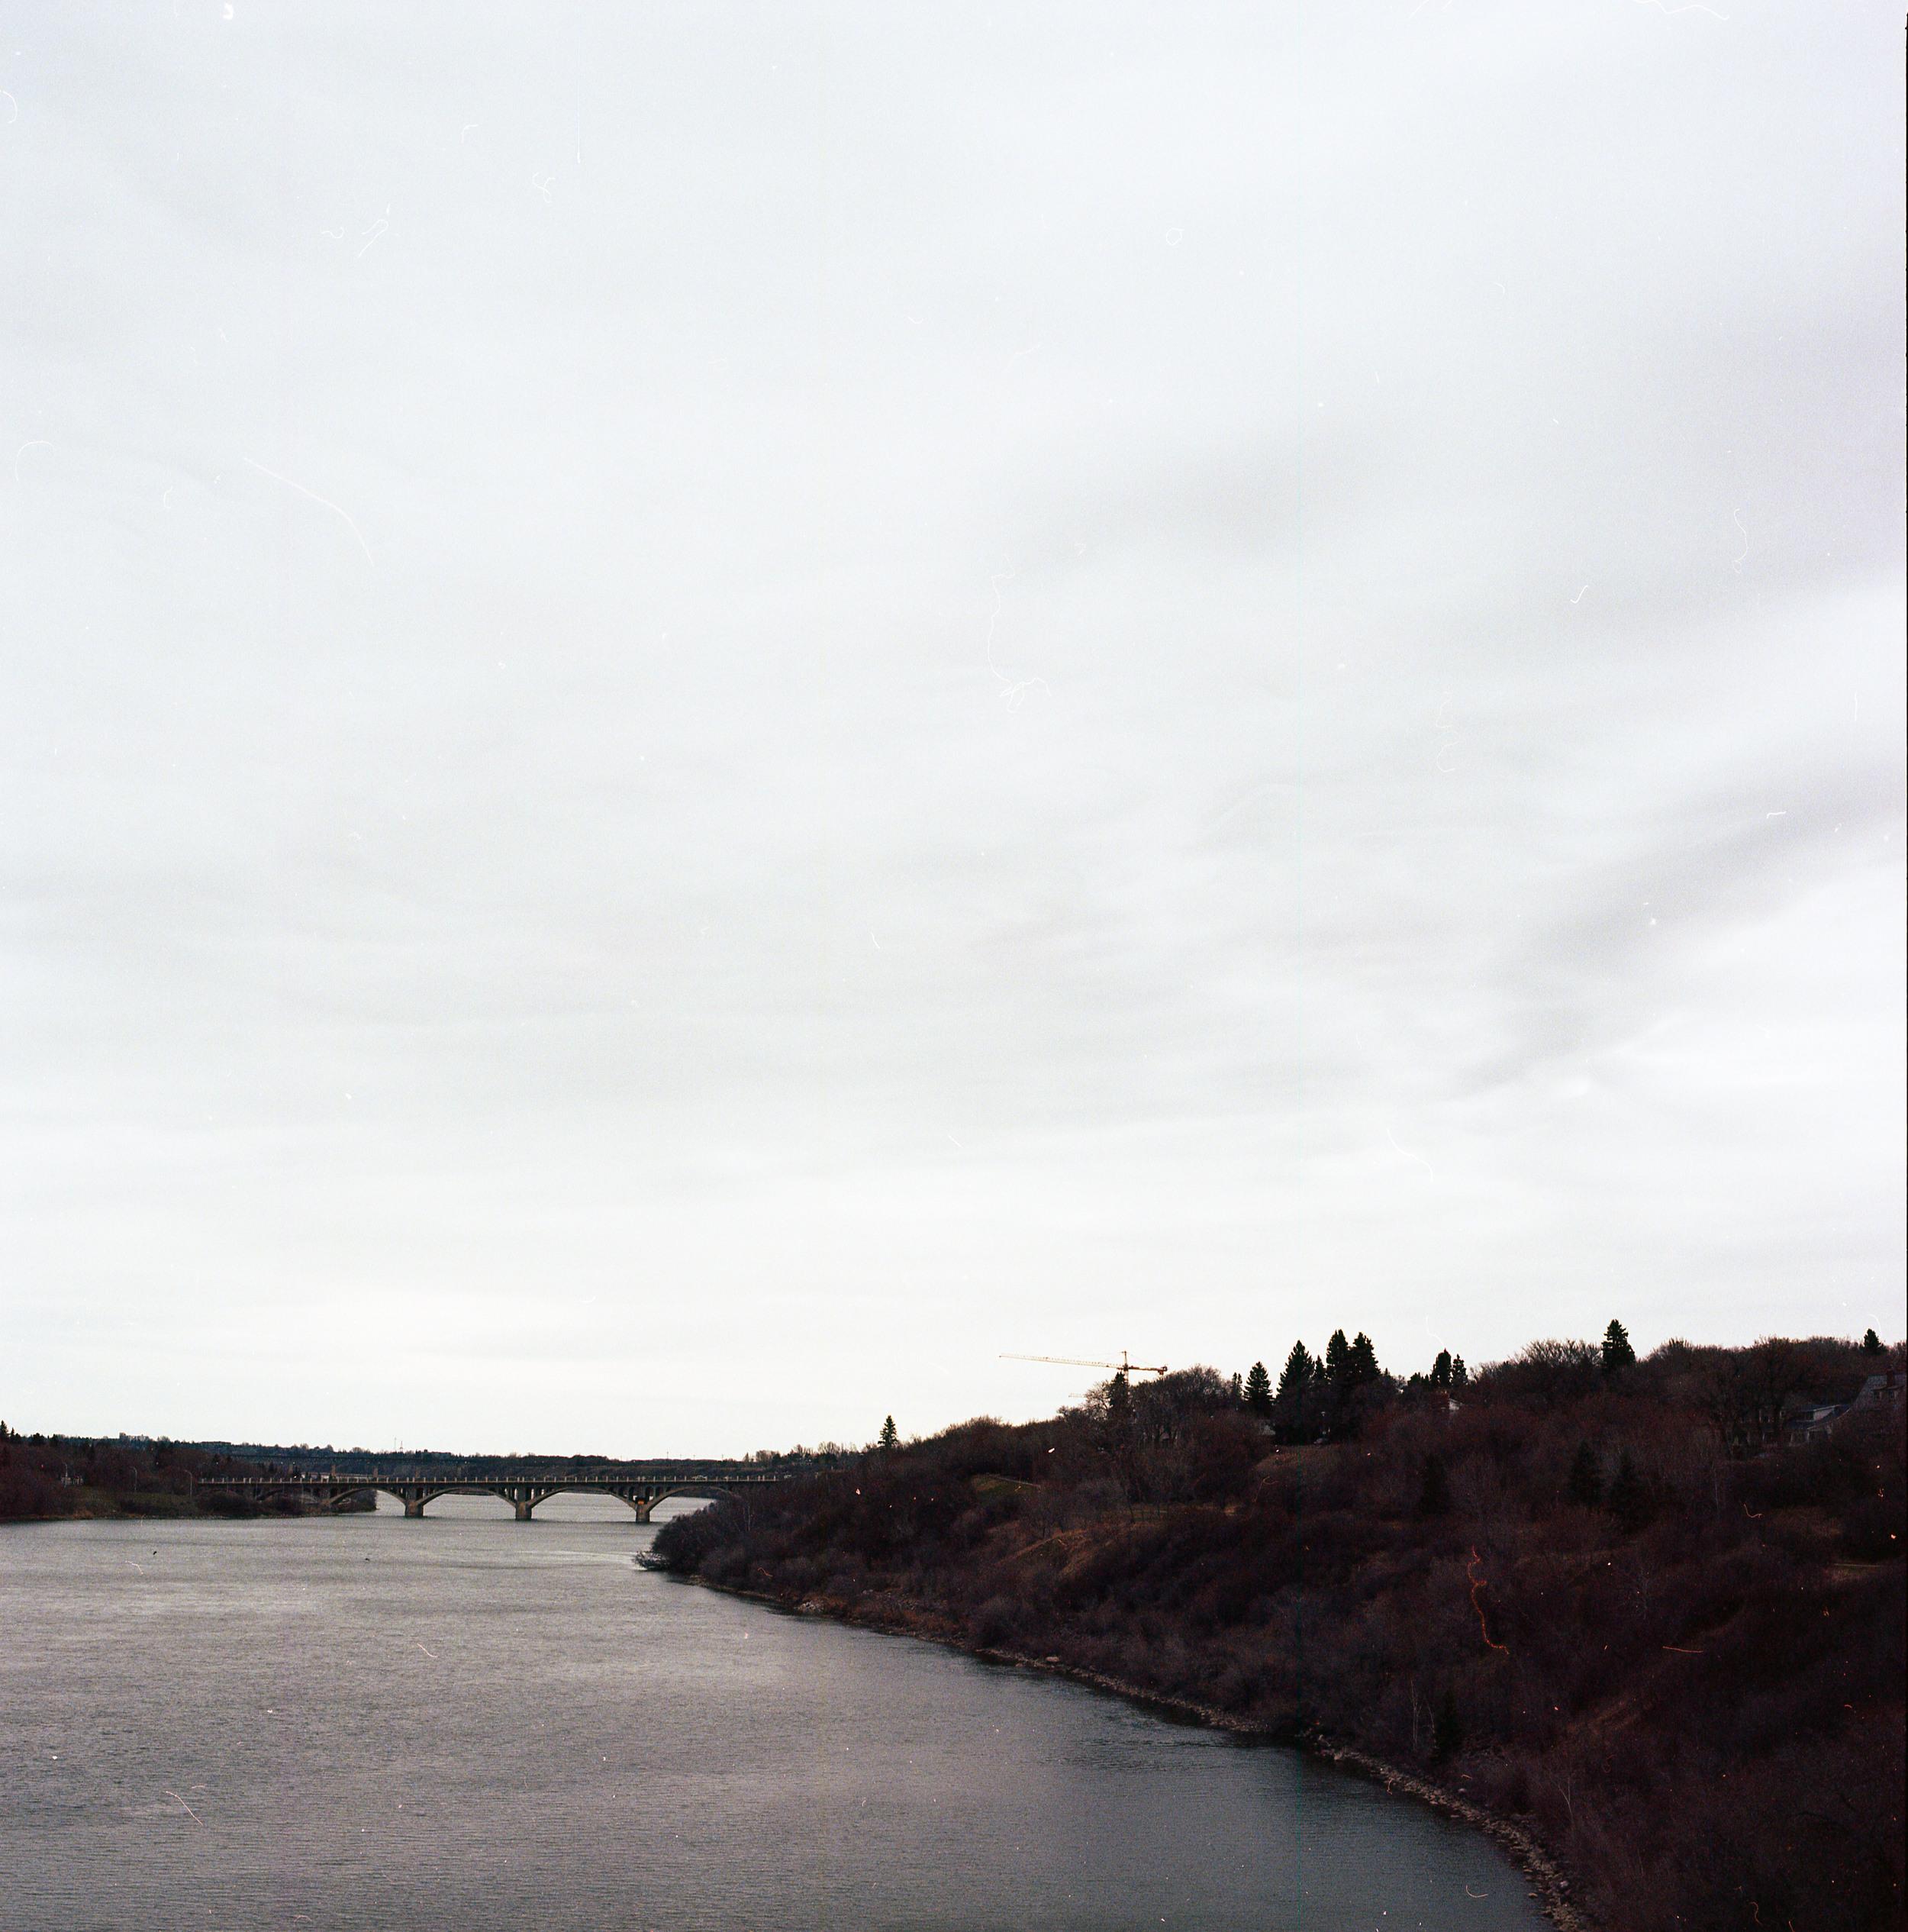 122 [F] Hasselblad 500CM - Kodak Portra 160 @ 640 - 019.jpg